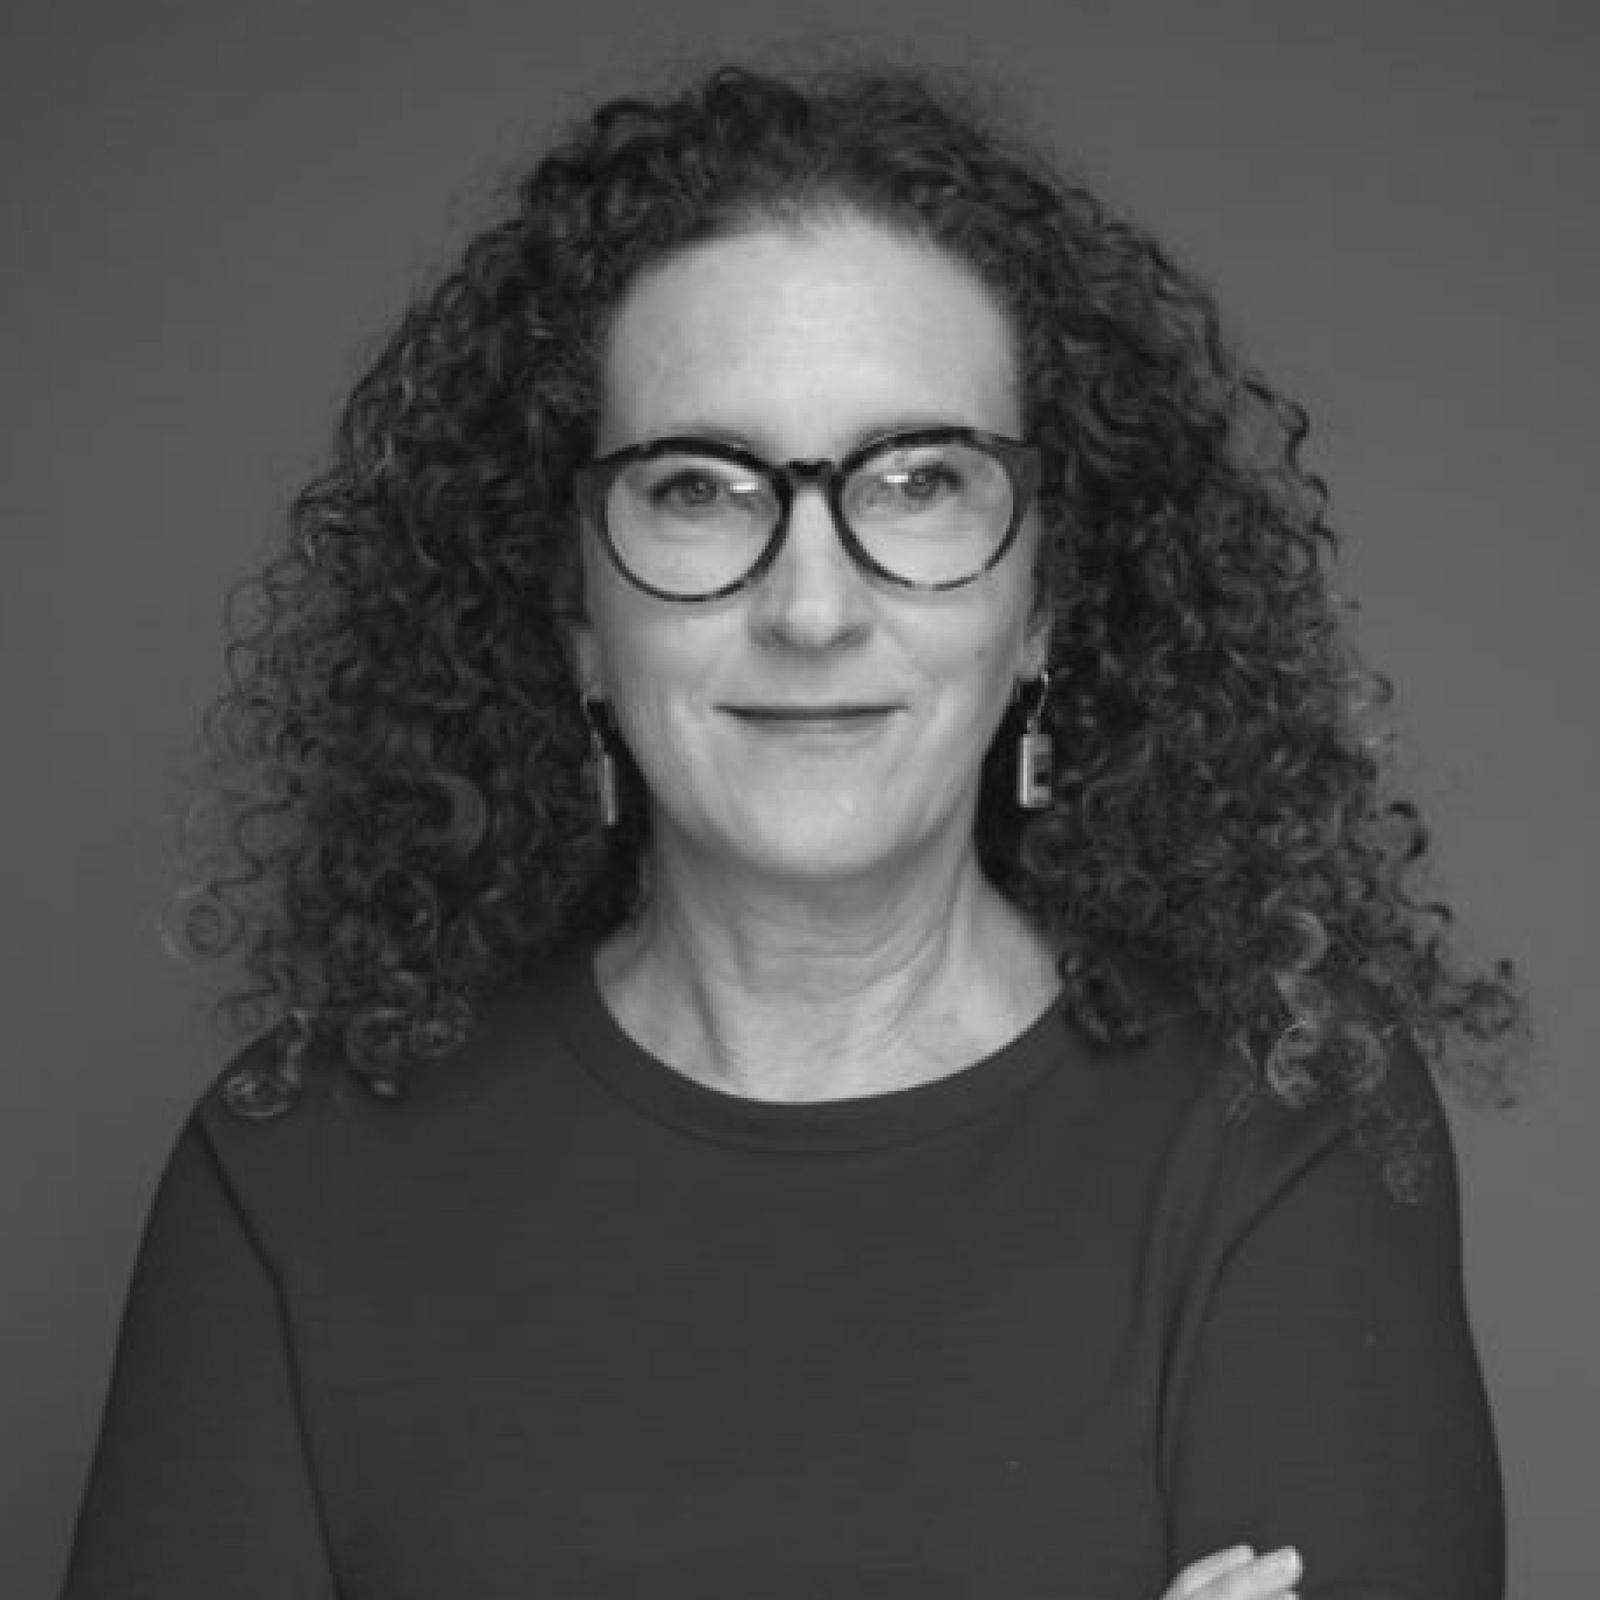 Judy Mam - Co-Founder, Dada.NYC